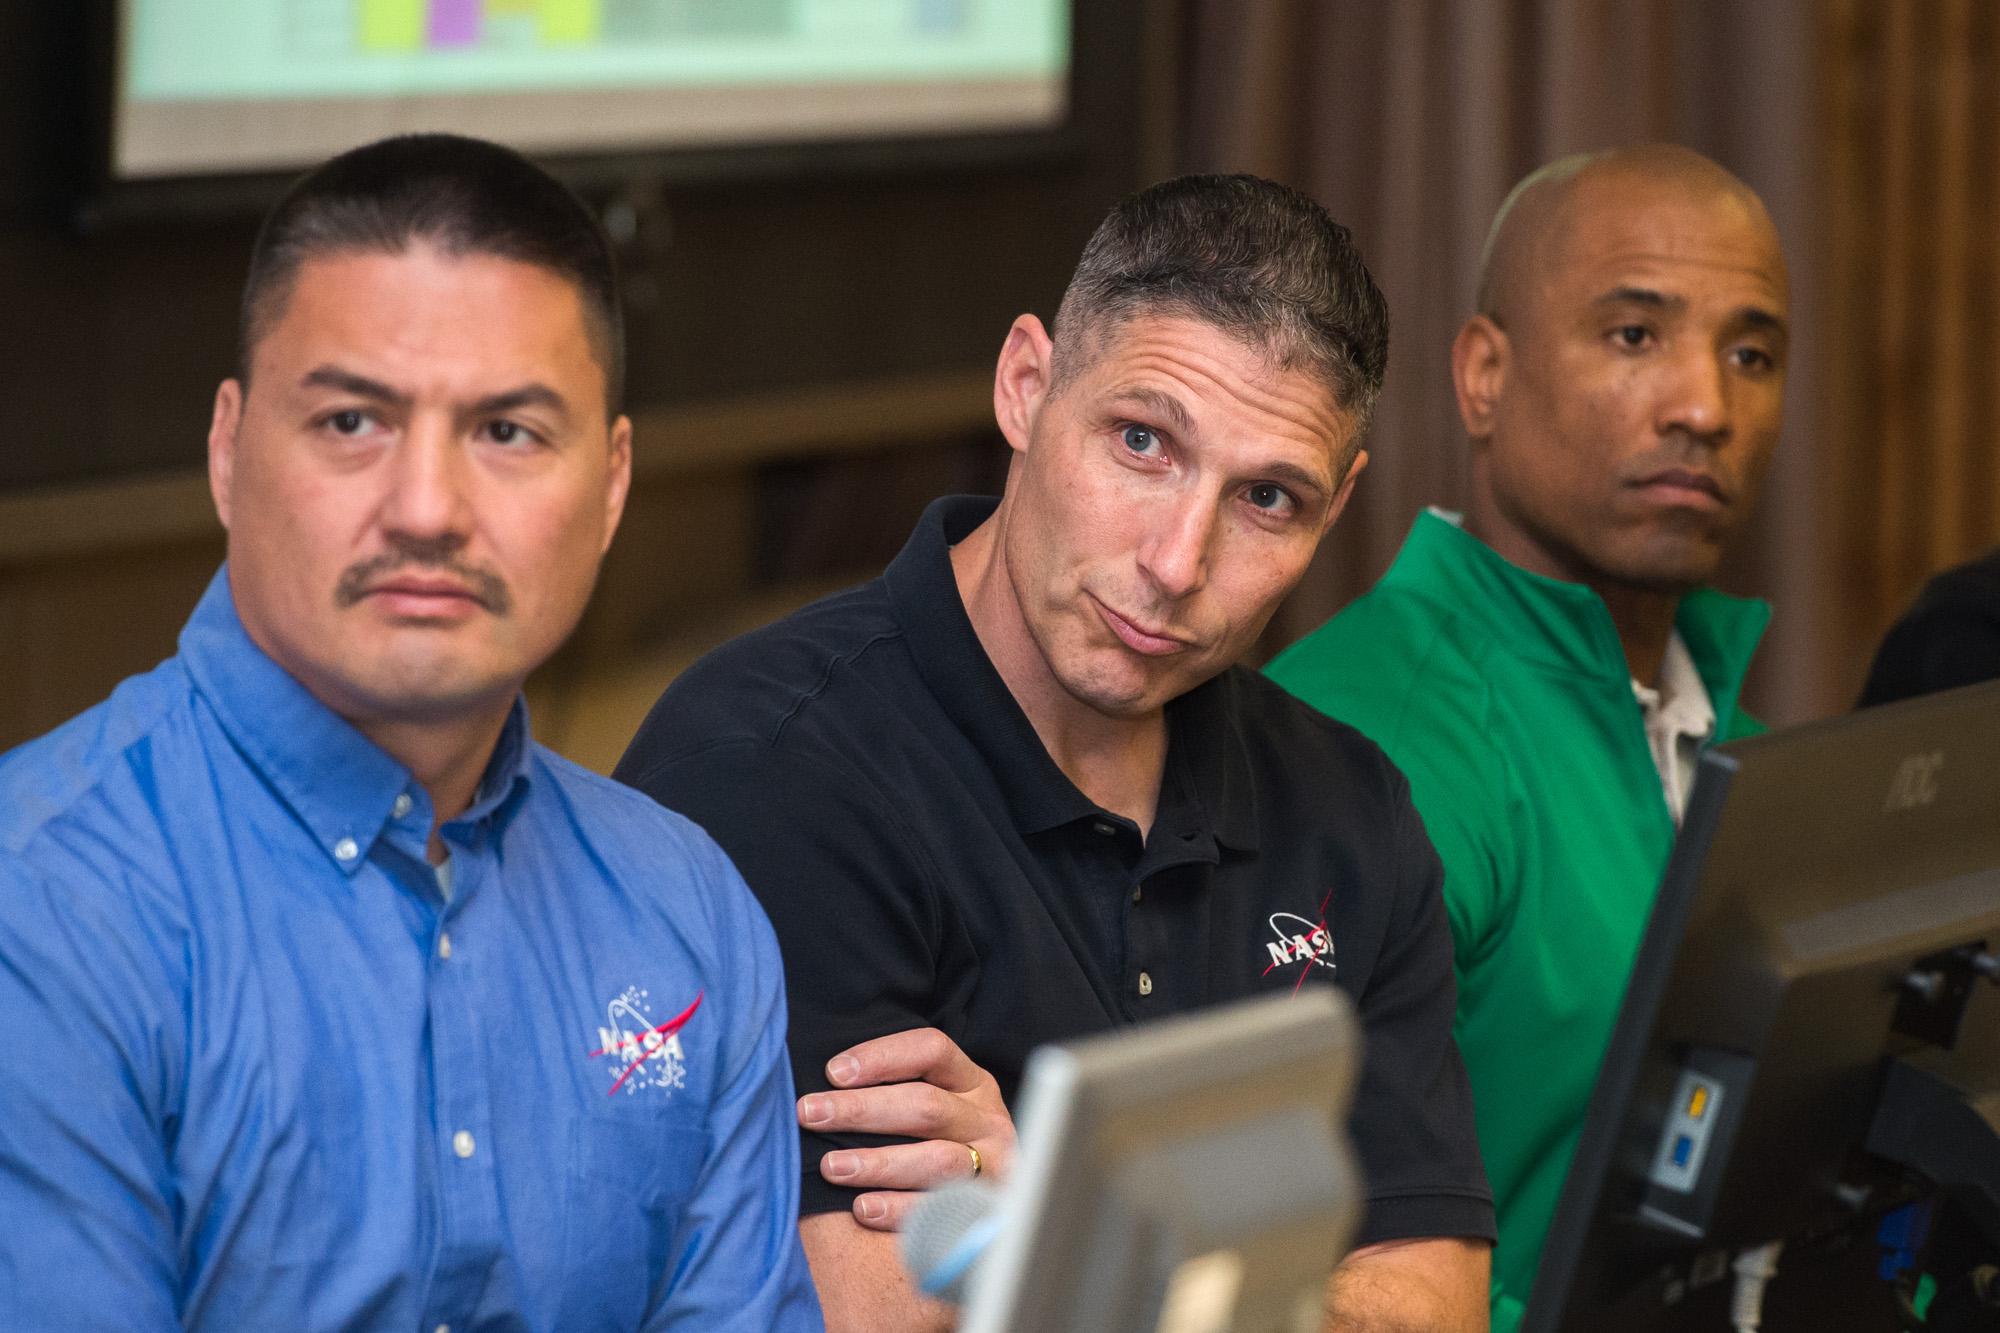 [SpaceX] Dragon Crew, les premiers équipages - Page 3 24152110